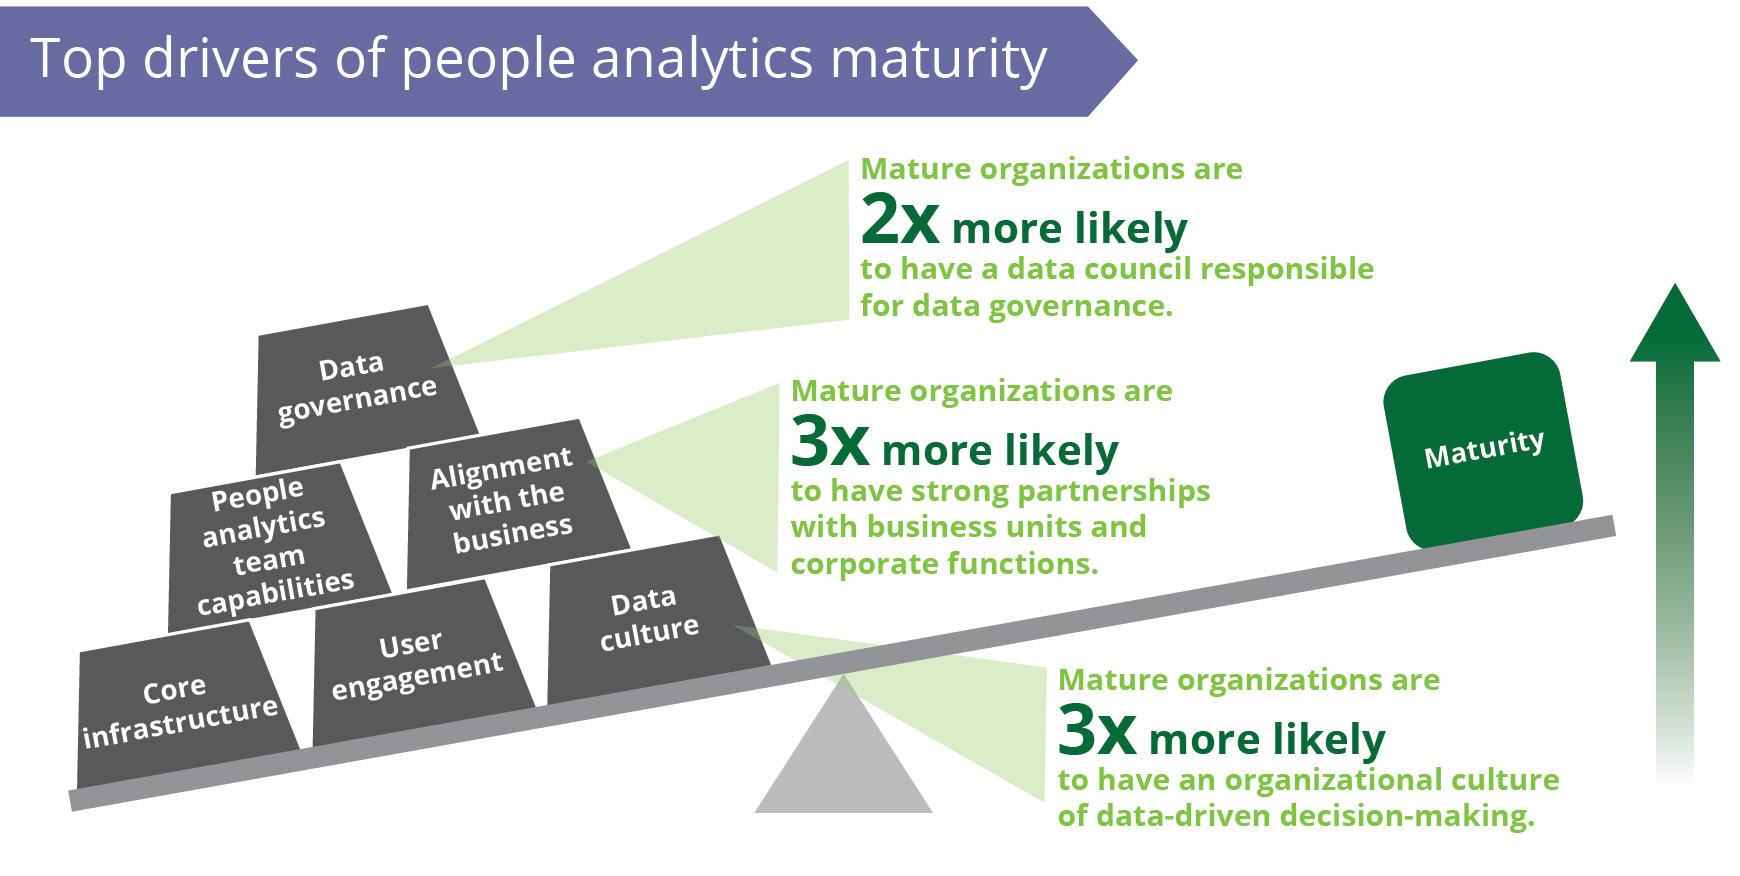 FIGURE 3   : The top drivers of People Analytics maturity (Source: Josh Bersin, Bersin by Deloitte High-Impact People Analytics study)